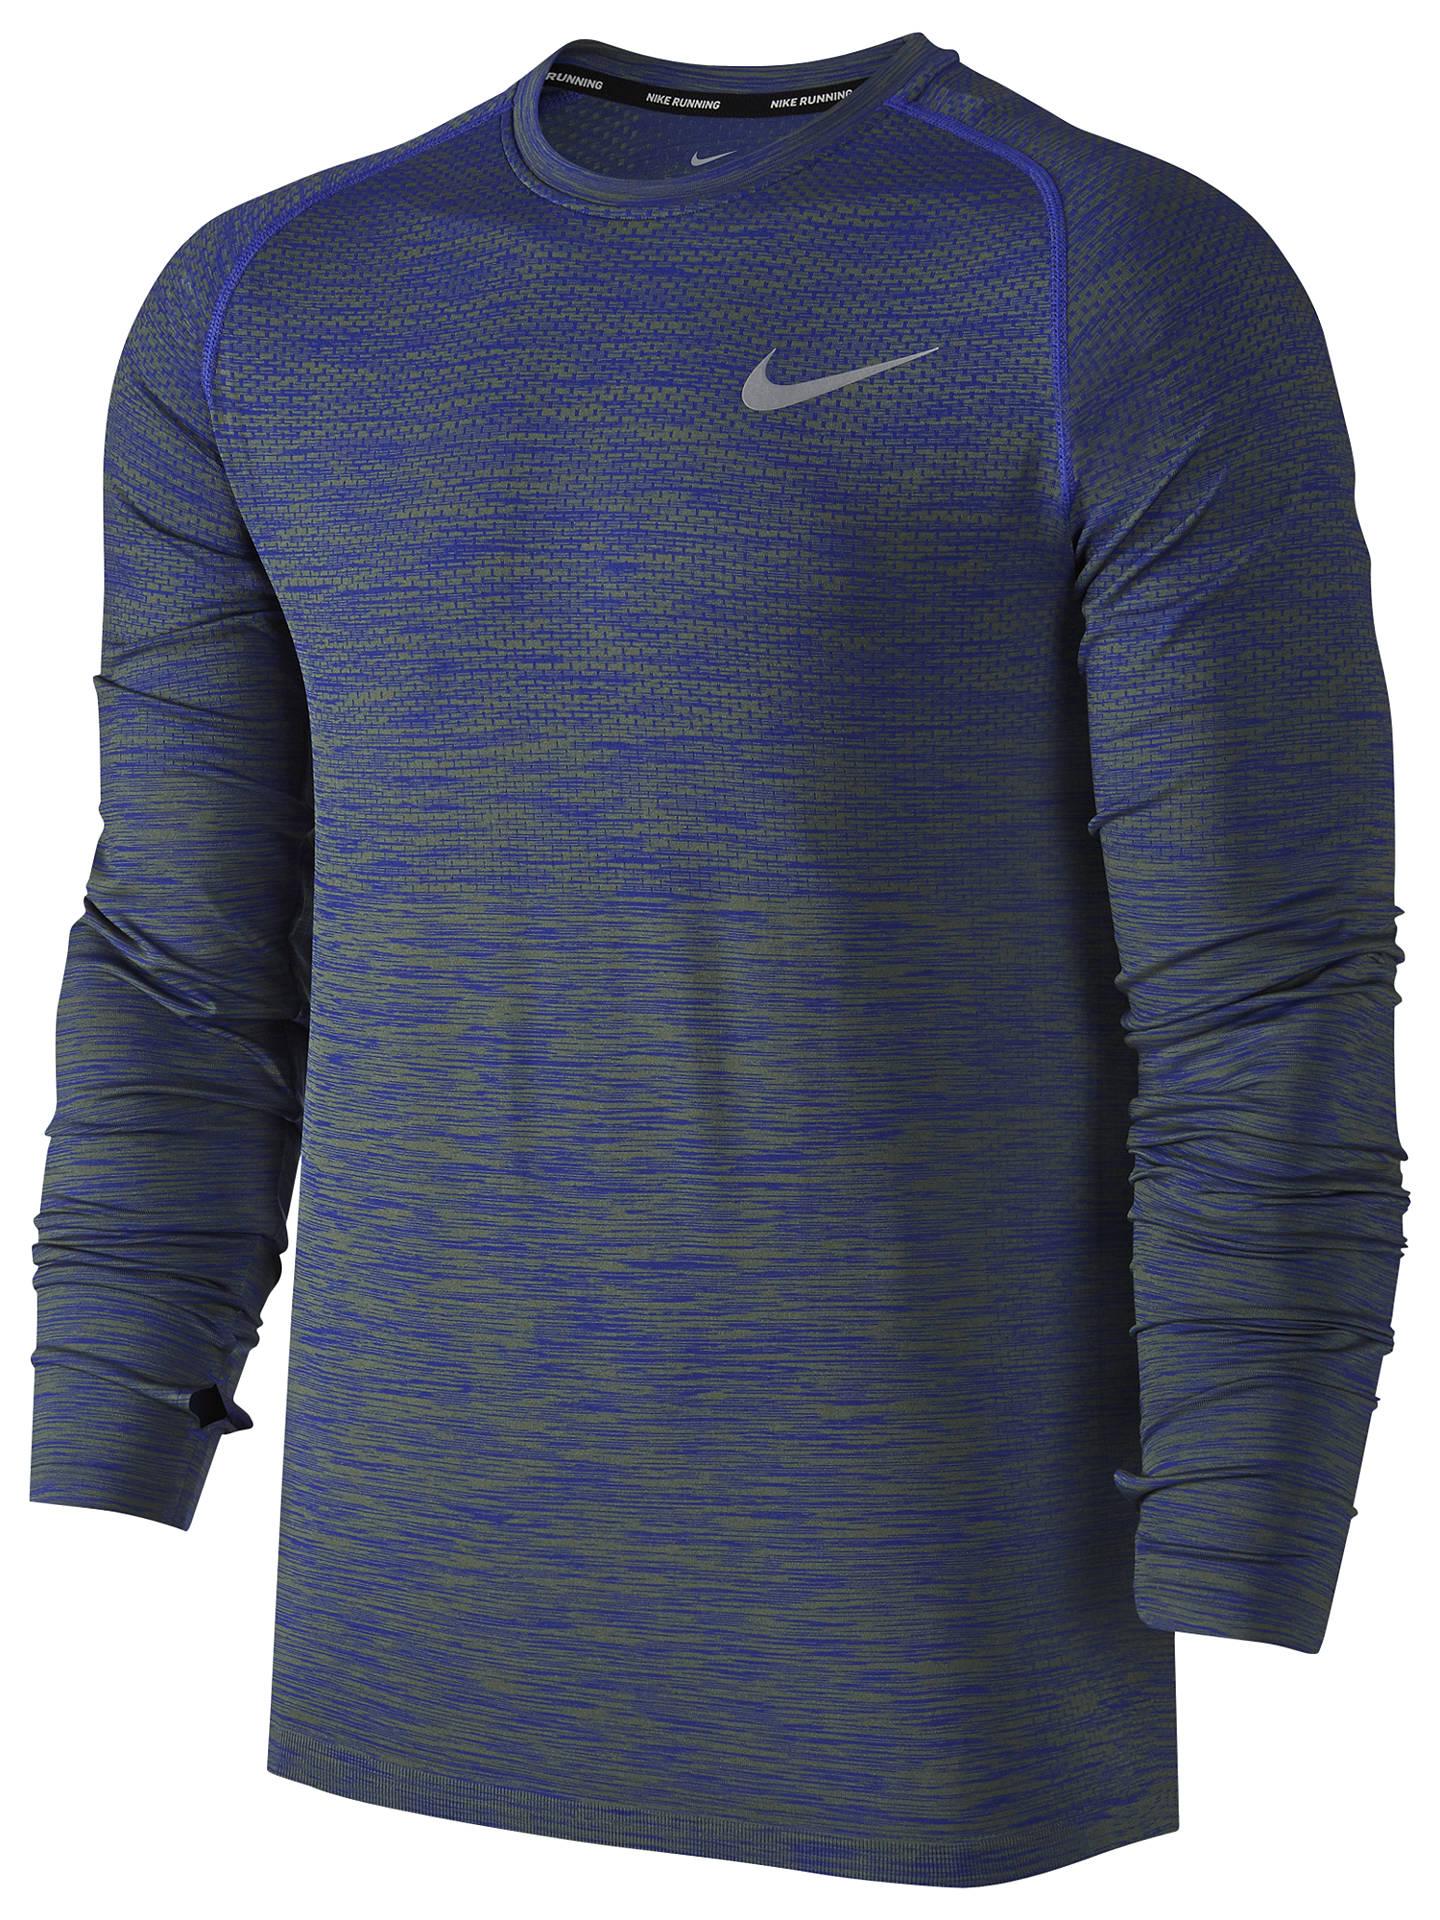 a752064cdbb6fe Buy Nike Dri-FIT Knit Long Sleeve Running Top, Paramount Blue/Palm Green ...